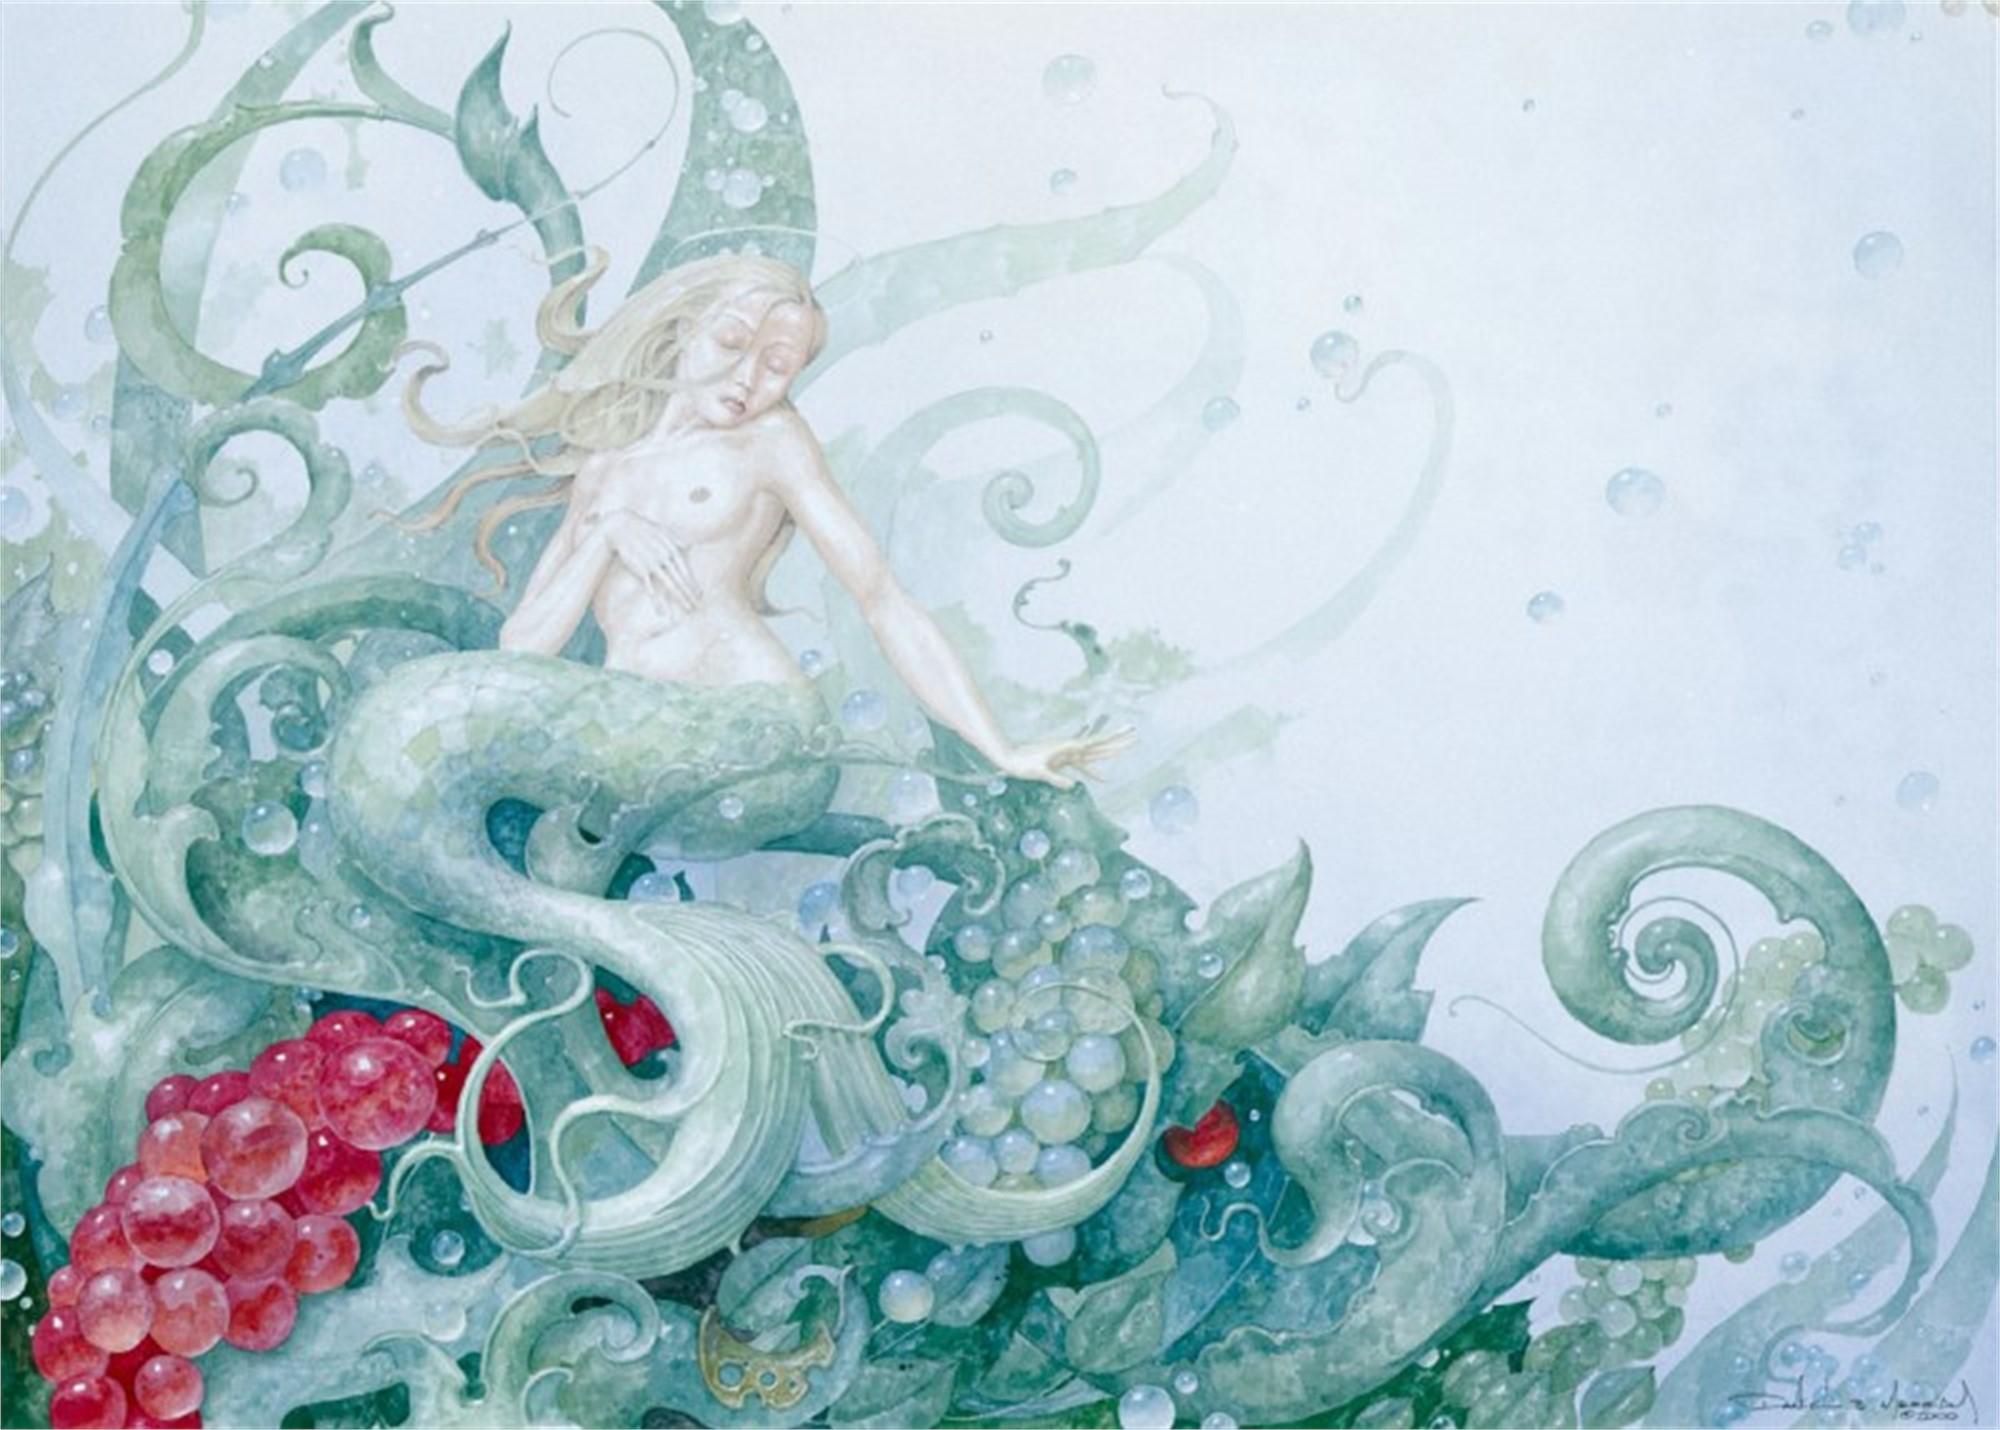 Siren by Daniel Merriam